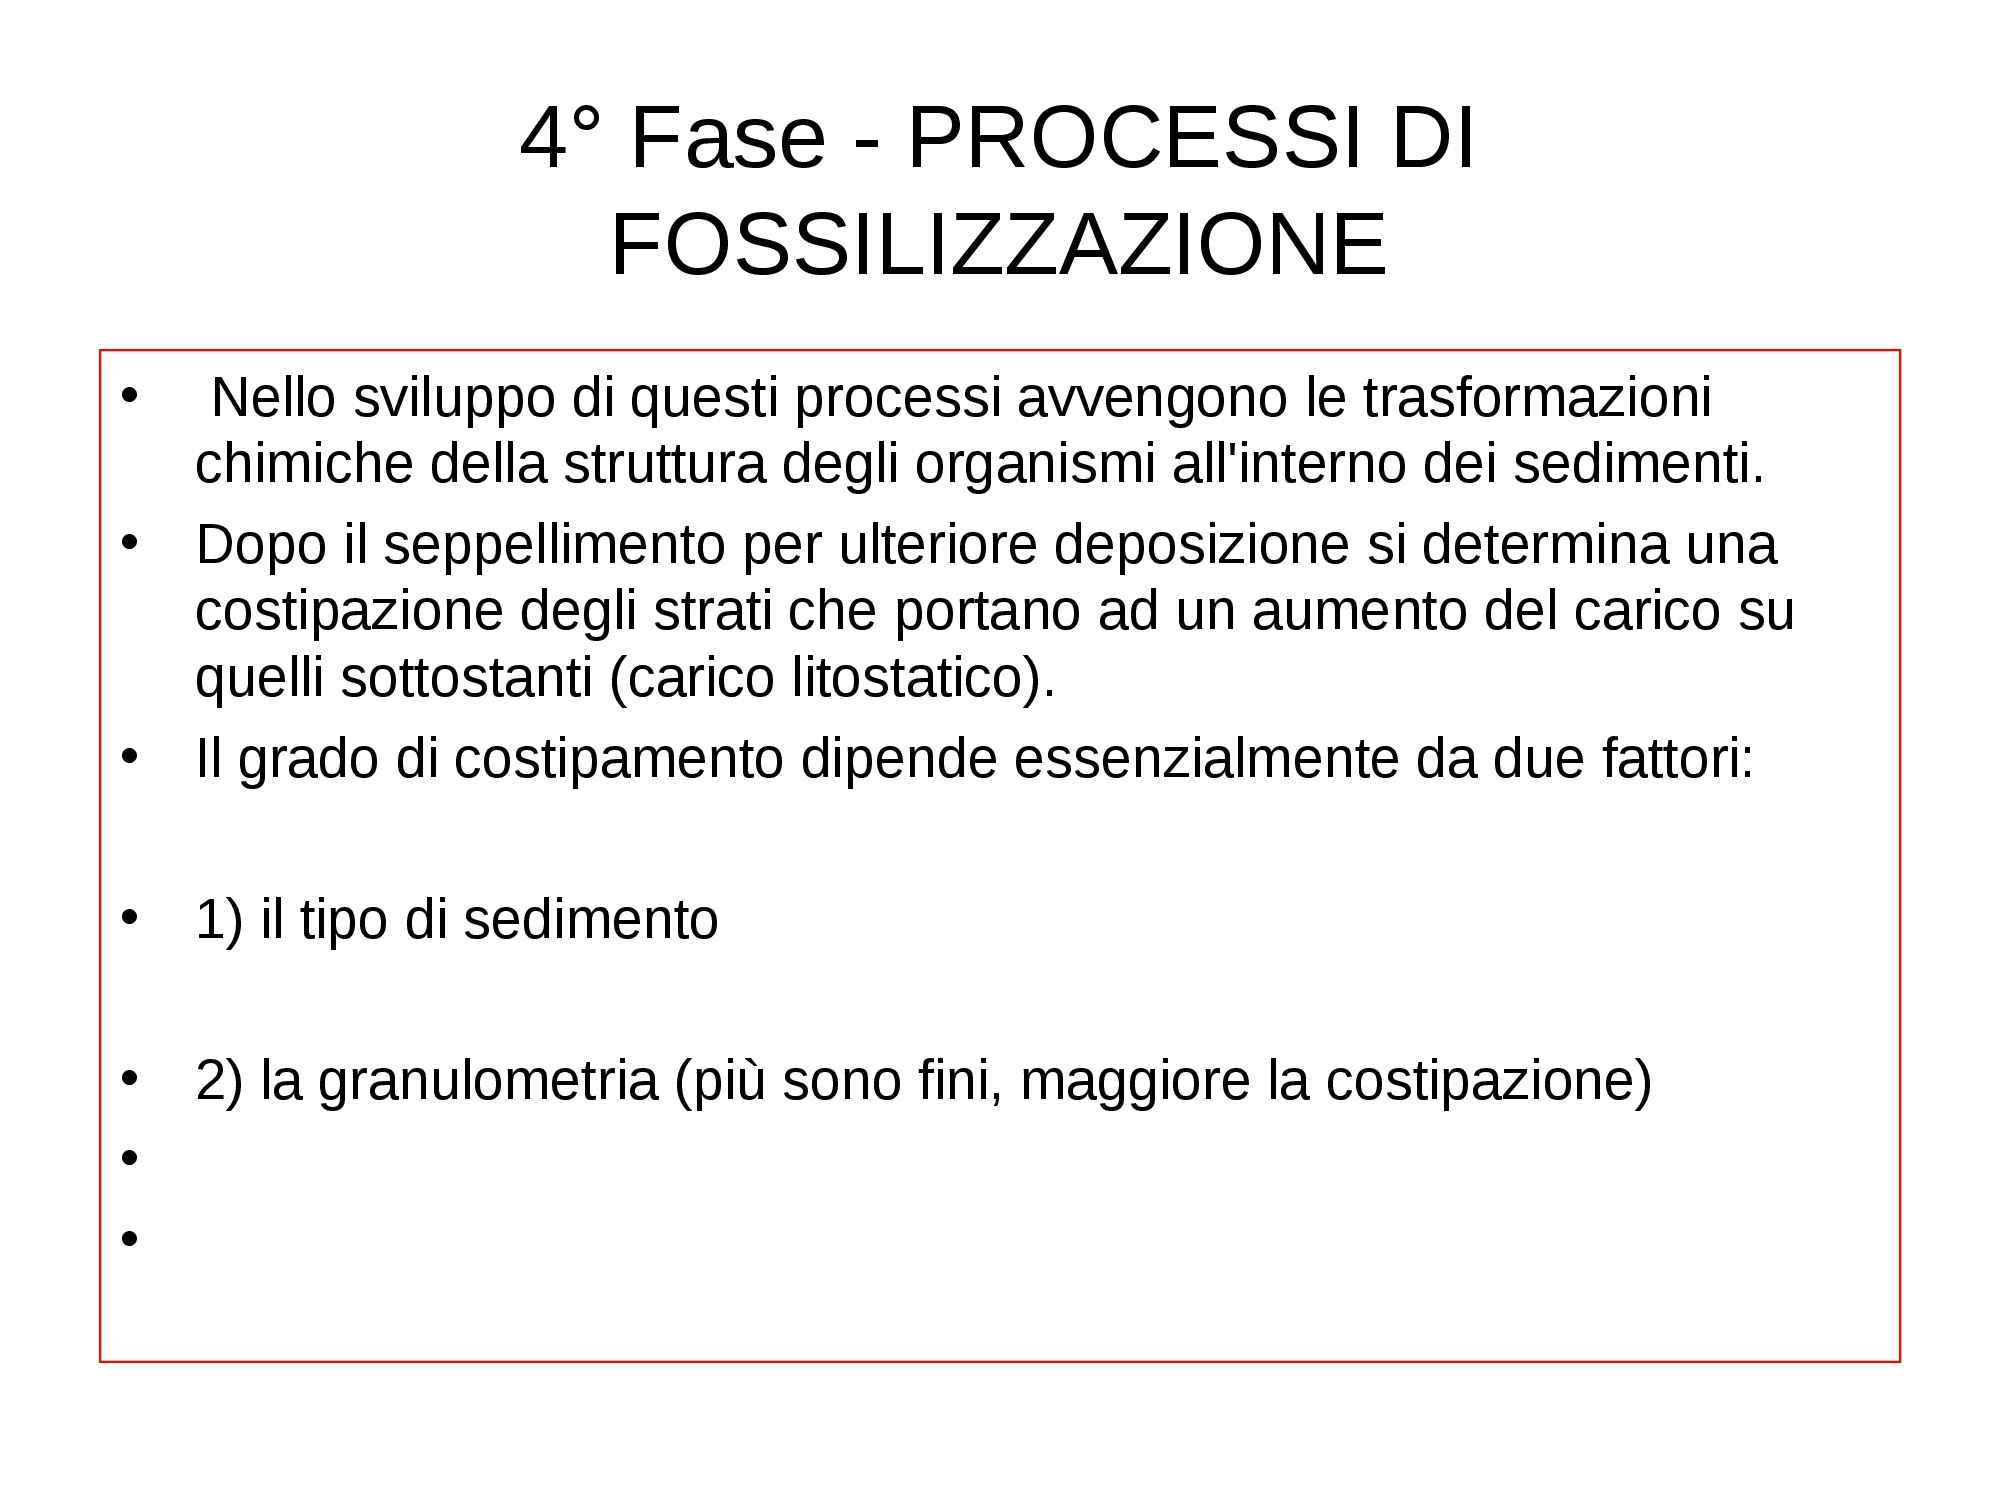 dispensa W. Landini Paleontologia